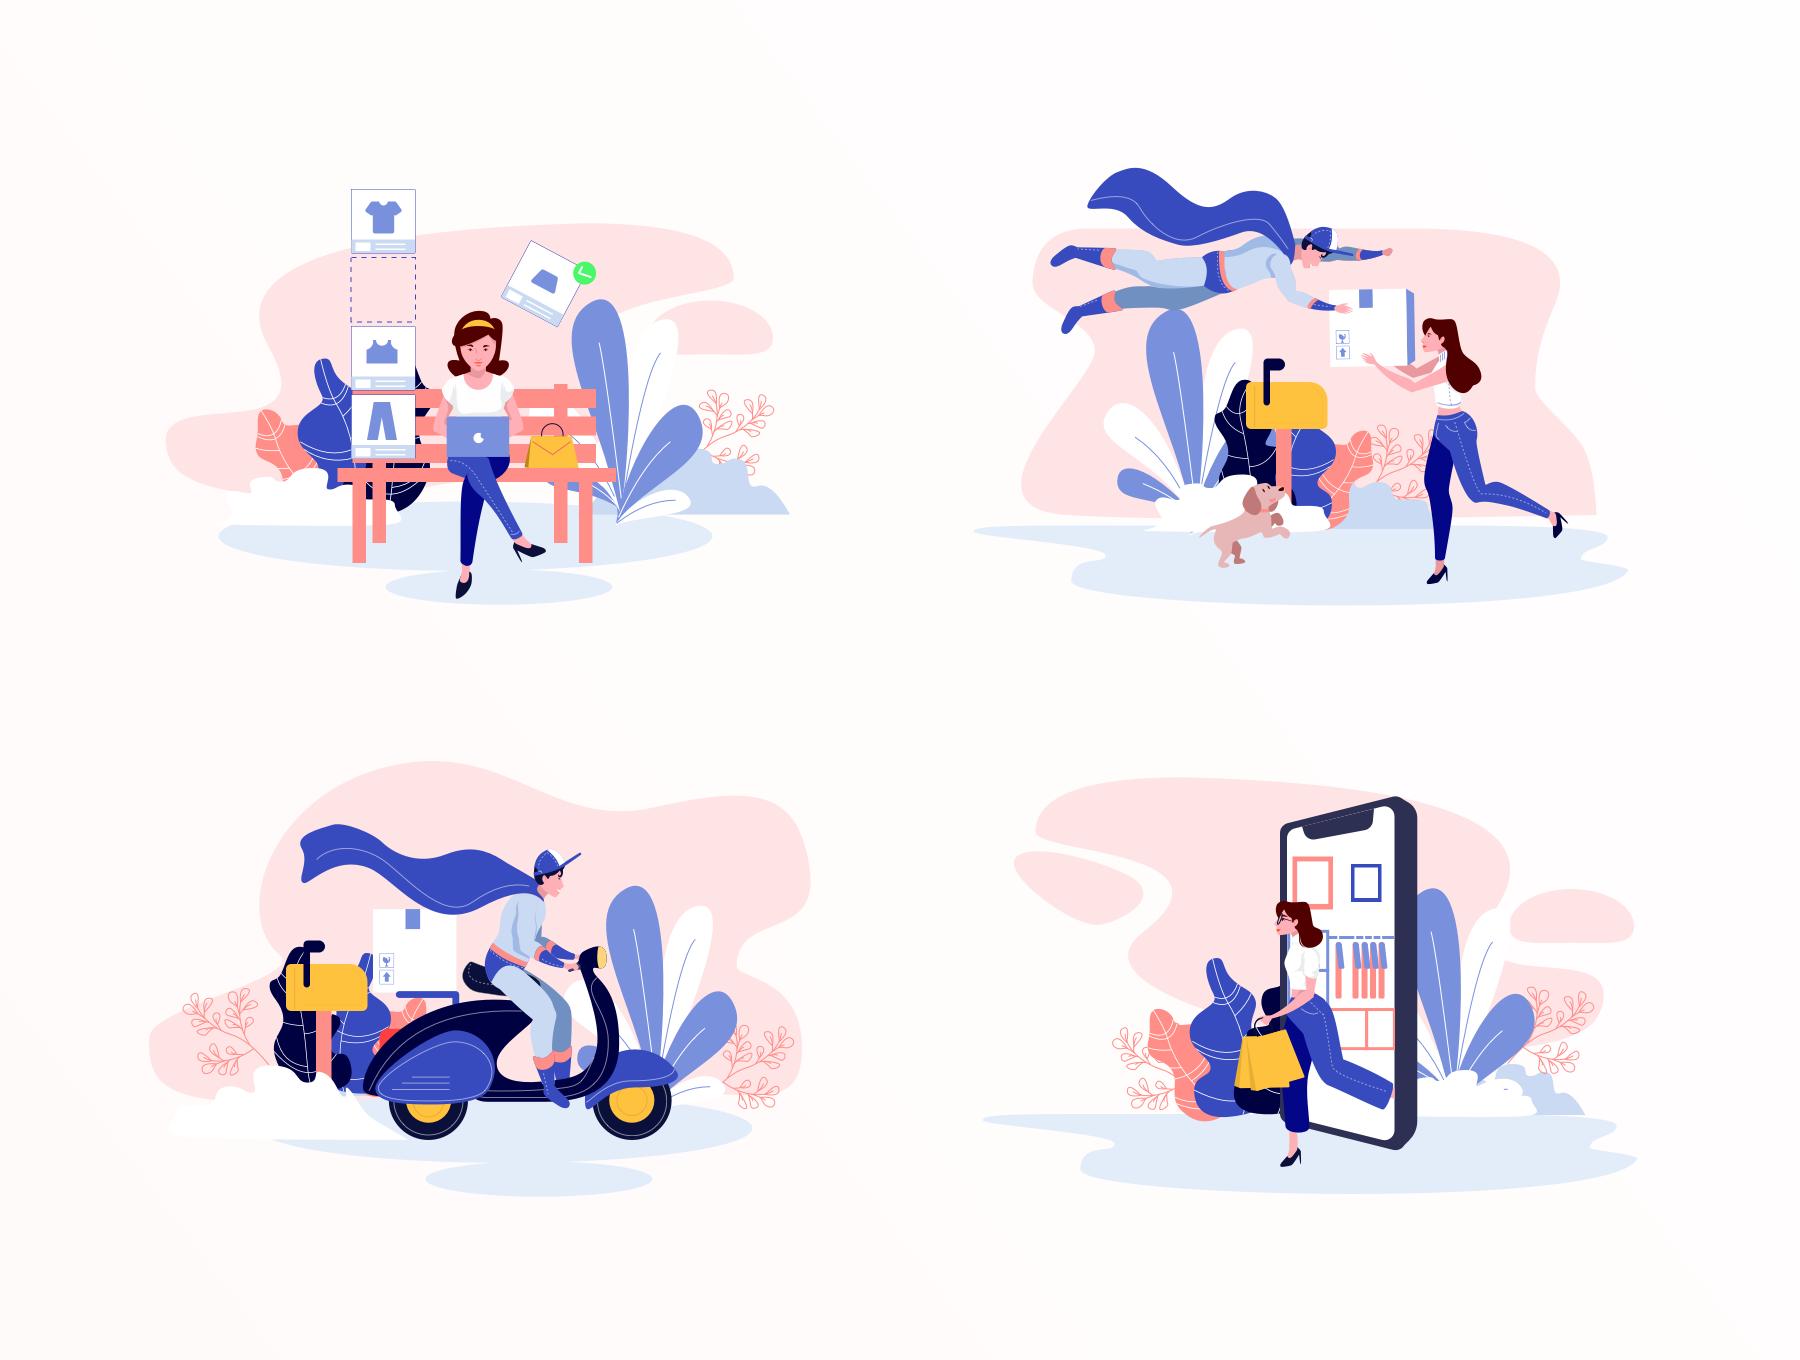 时尚购物商城2.5D矢量概念插画 Lunas : E-commerce Illustration Kit插图(5)